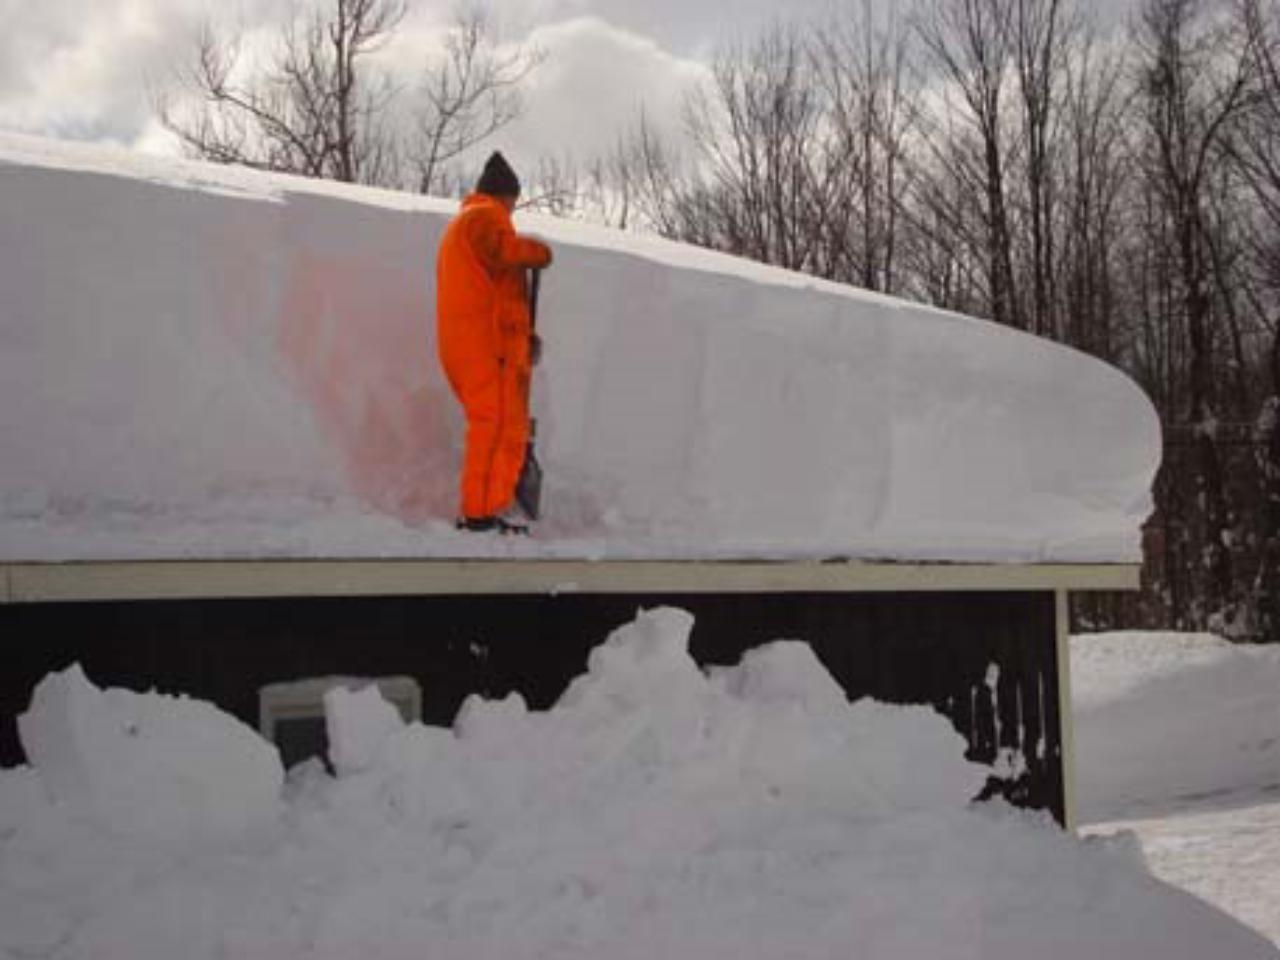 ВБашкирии ребенок умер отсошедшего скрыши снега